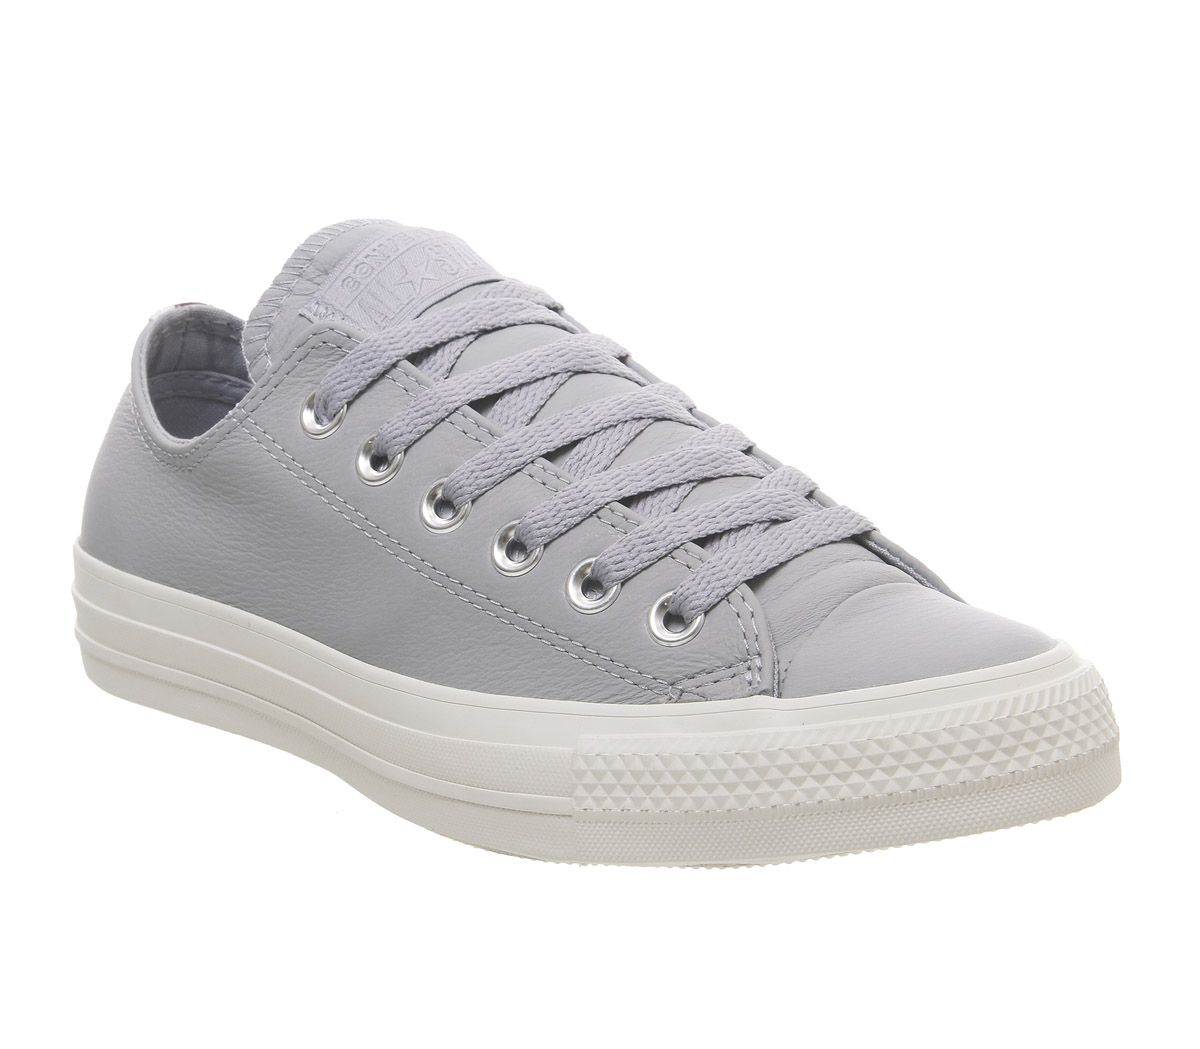 b538a8877b0 Converse Allstar Low Leather Trainers Wolf Grey Burgundy Navy Heel ...